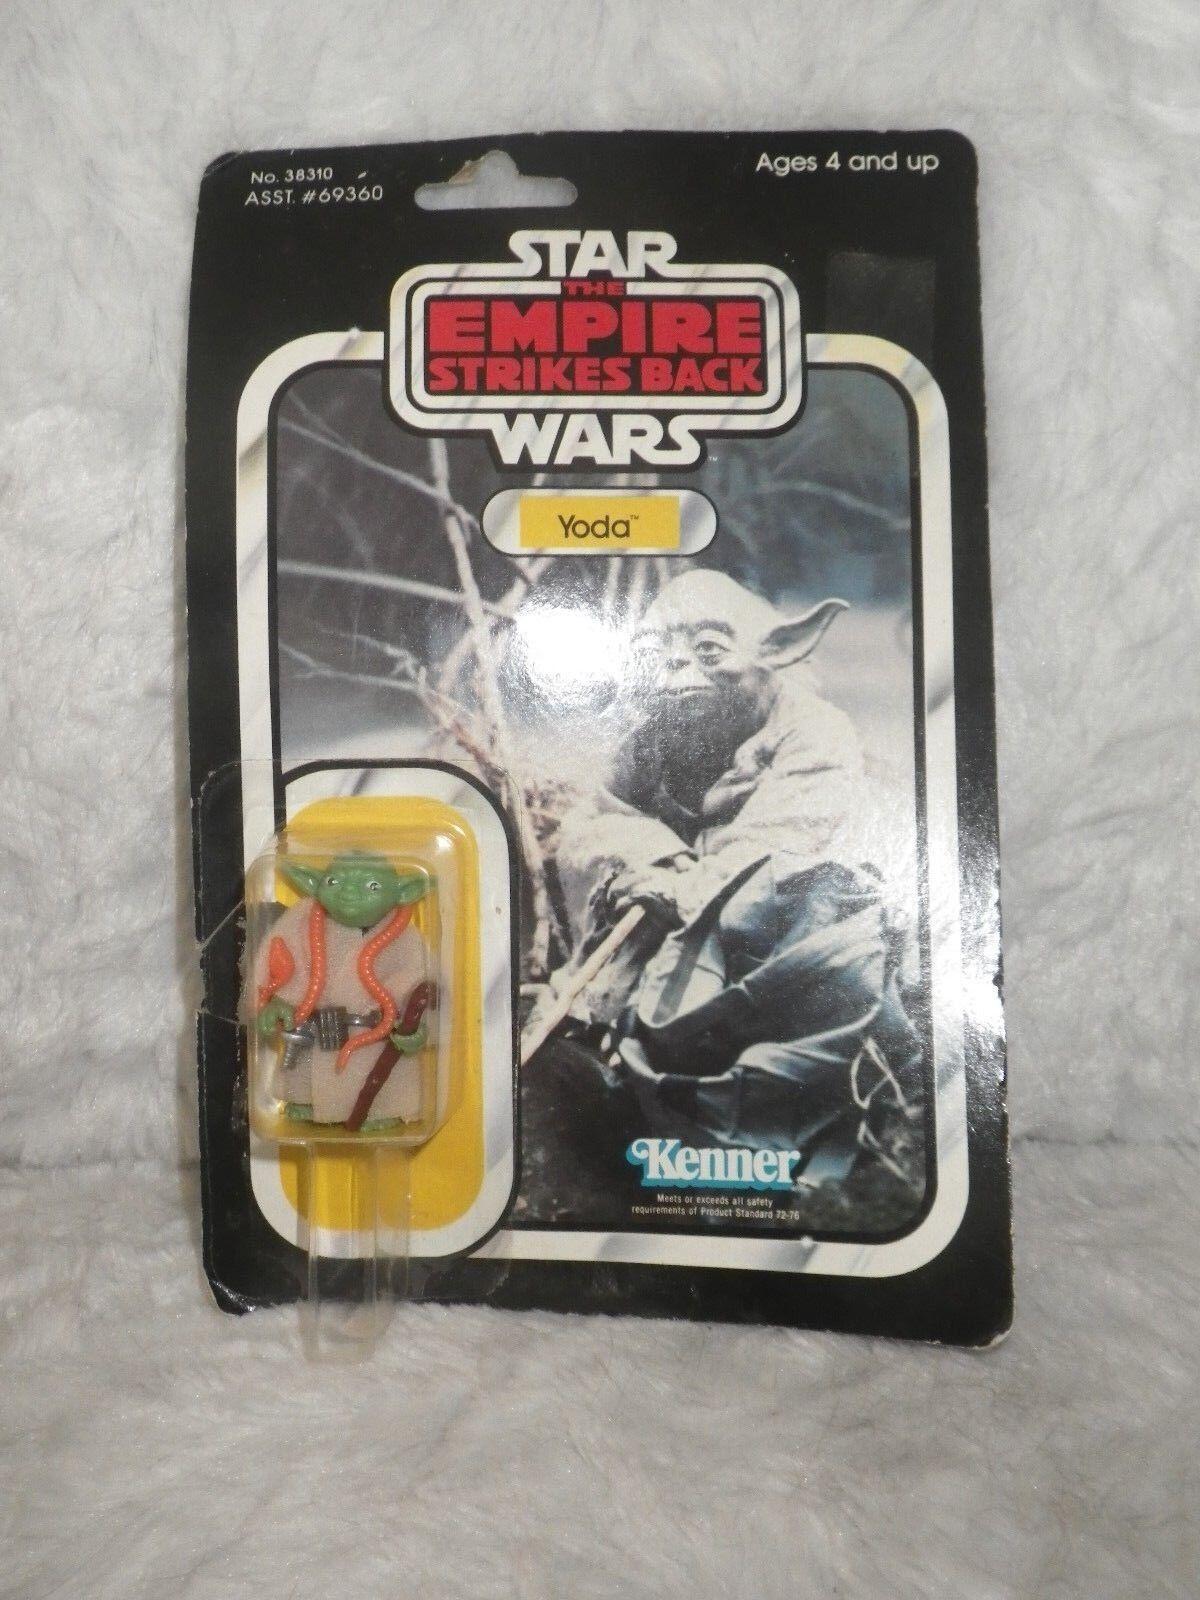 Star Wars NEW The Empire Strikes Back Yoda (orange Snake) 41 Card